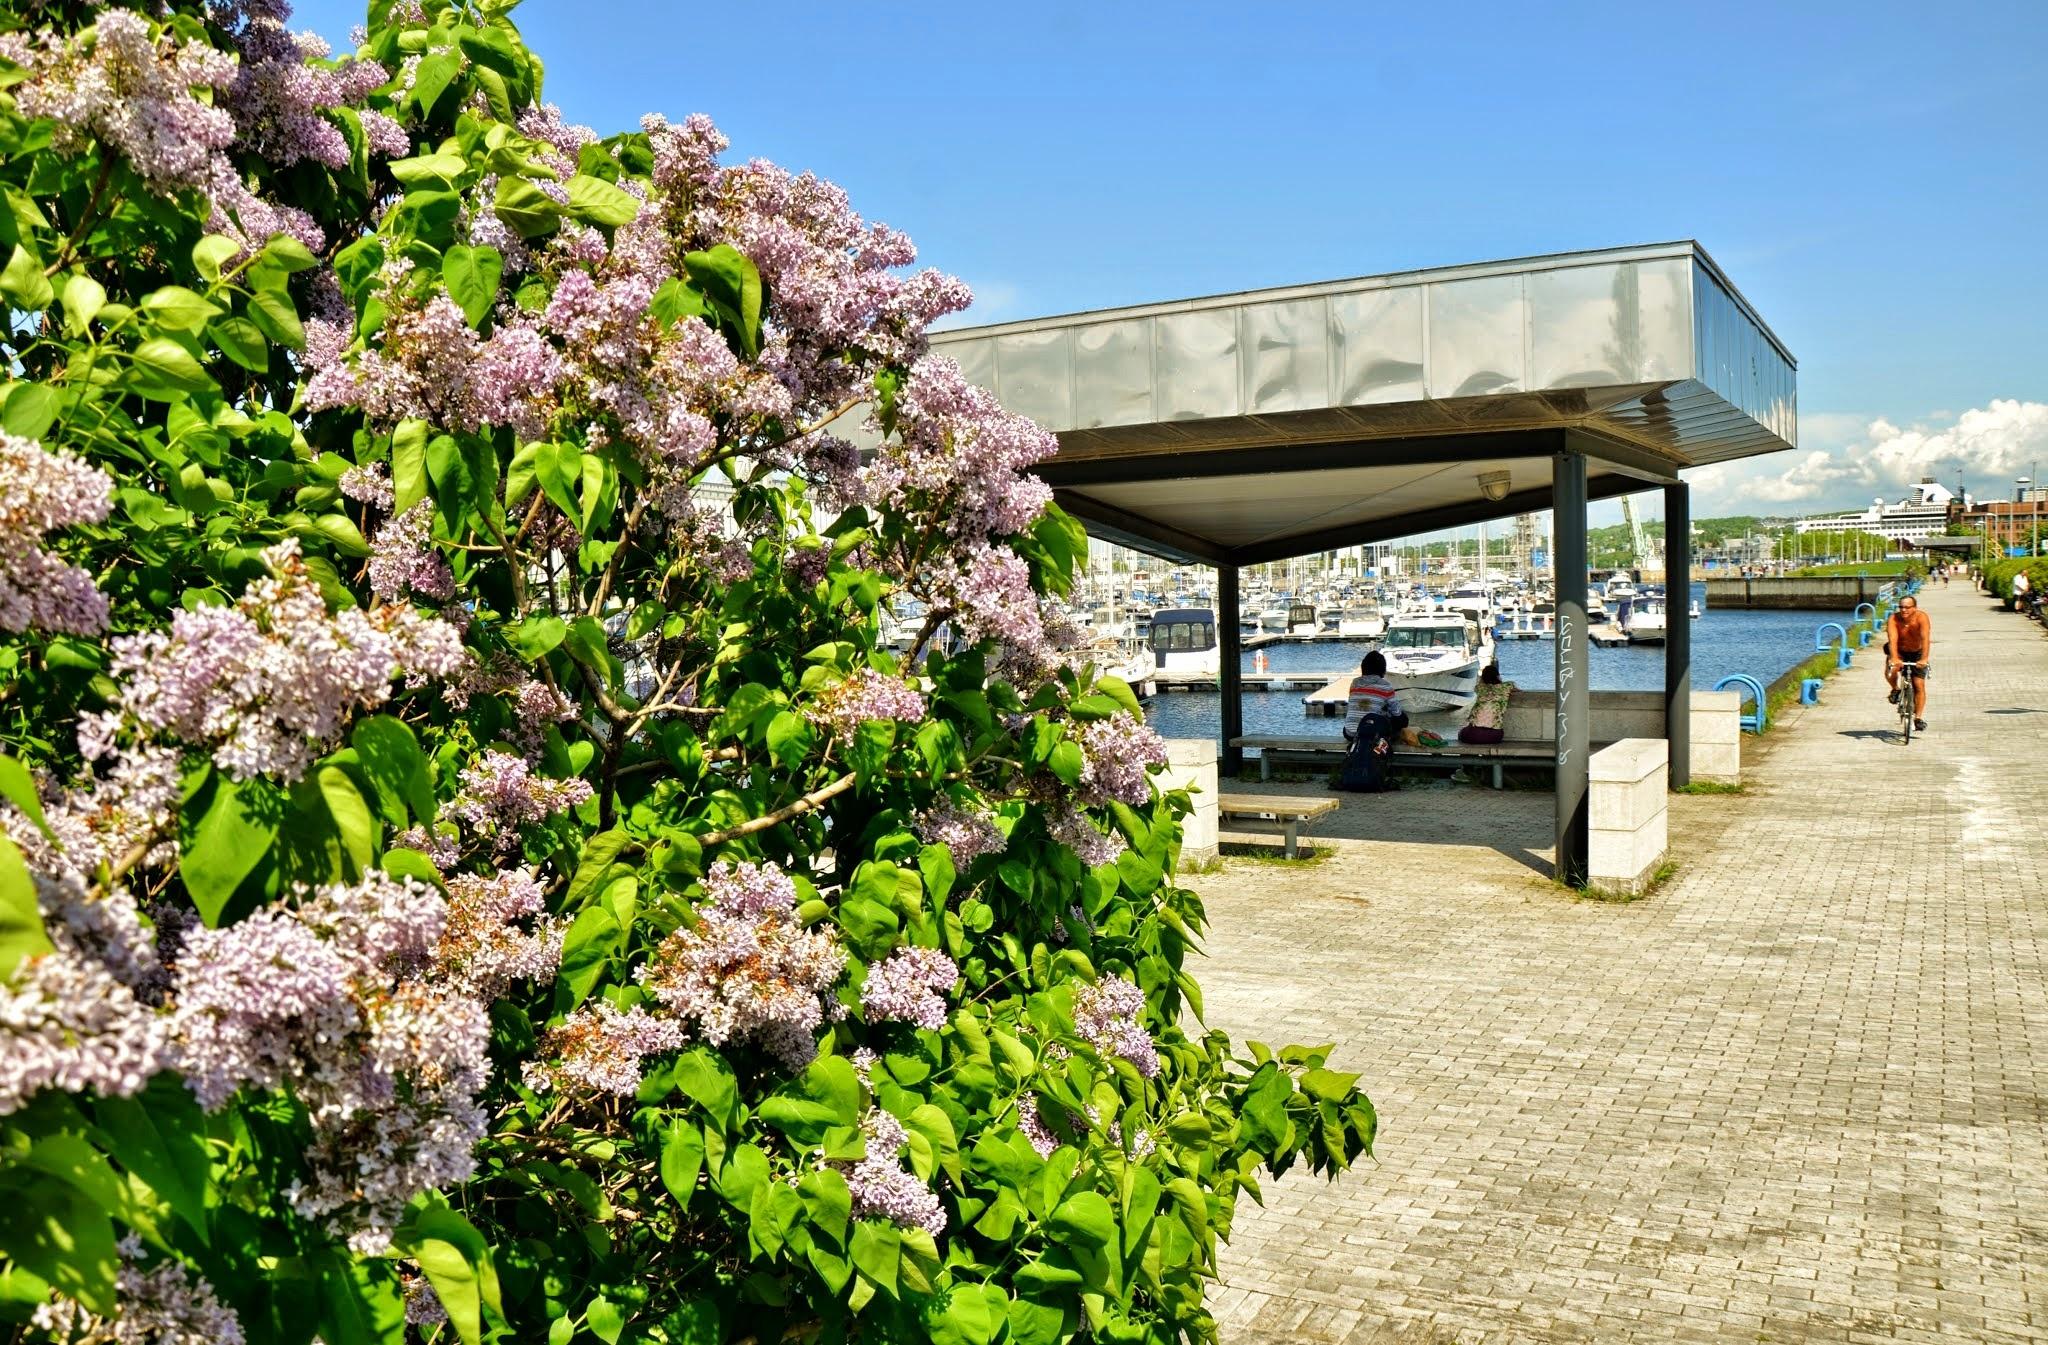 Lilas et marina font mon printemps by real.michaud.5036